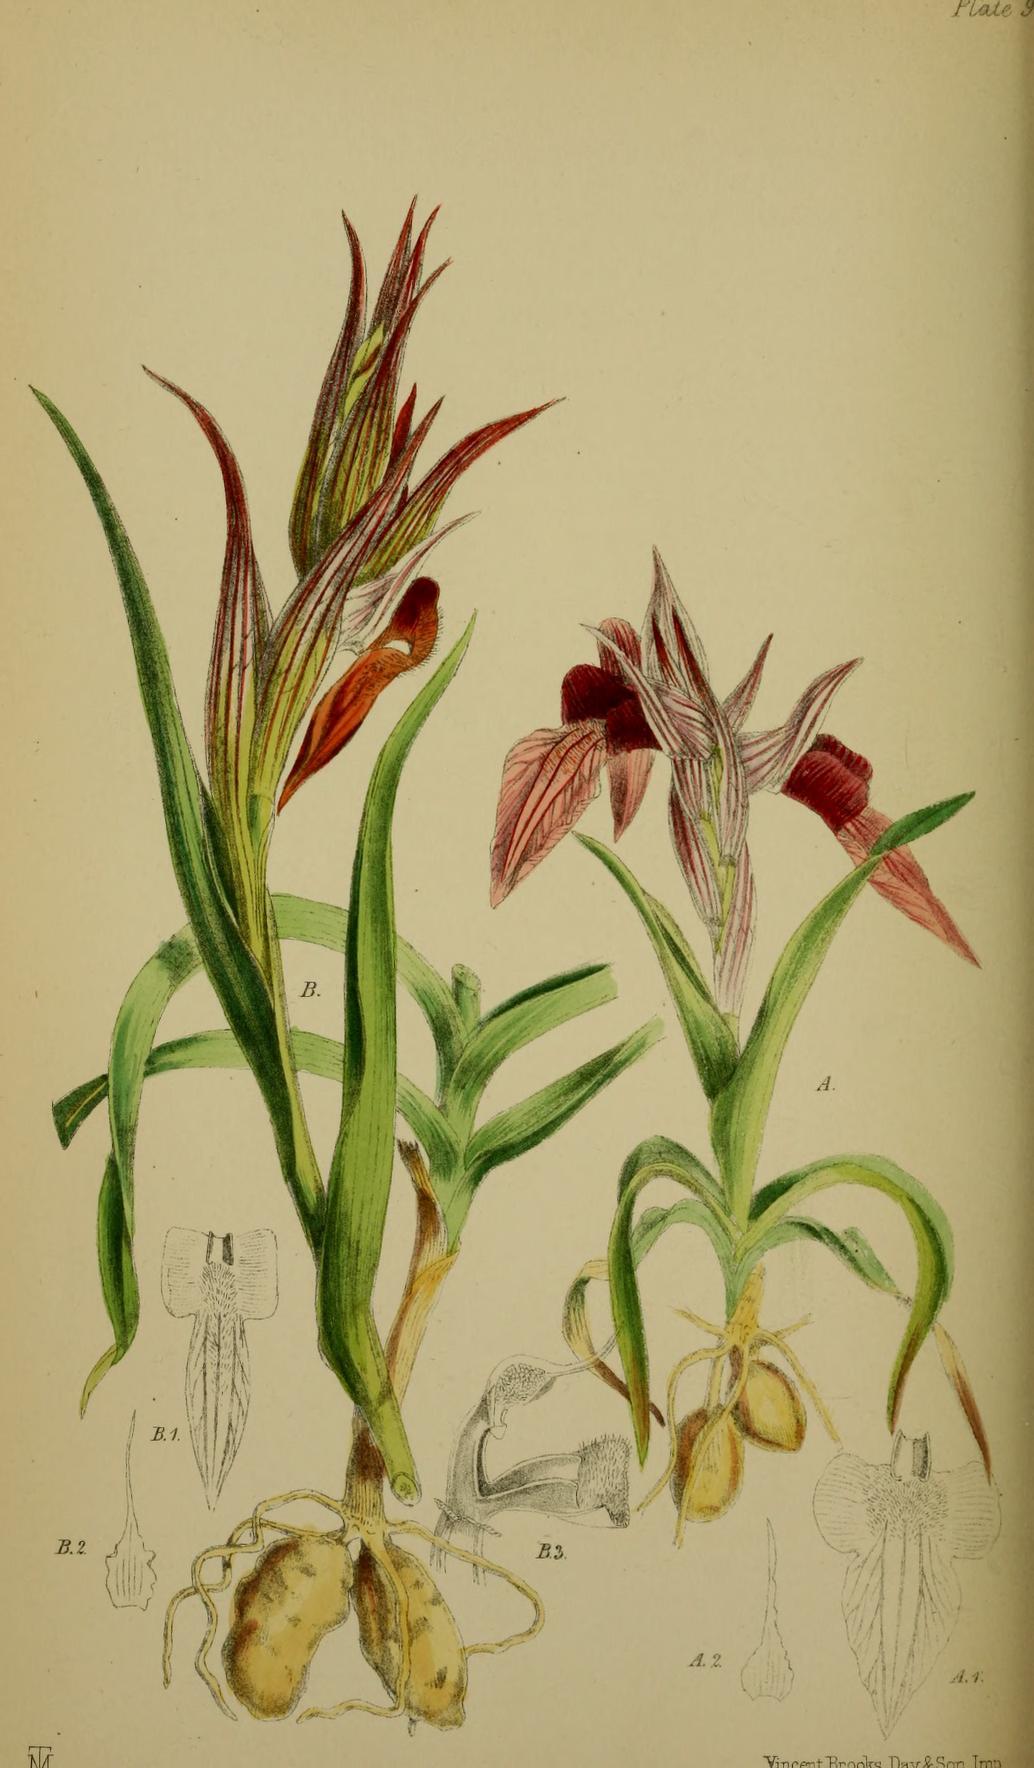 http://upload.wikimedia.org/wikipedia/commons/a/af/Serapias_neglecta_-_Serapias_vomeracea_(as_Serapias_longipetala)_-_Moggridge_-_Flora_of_Mentone_pl._94_(1871).jpg